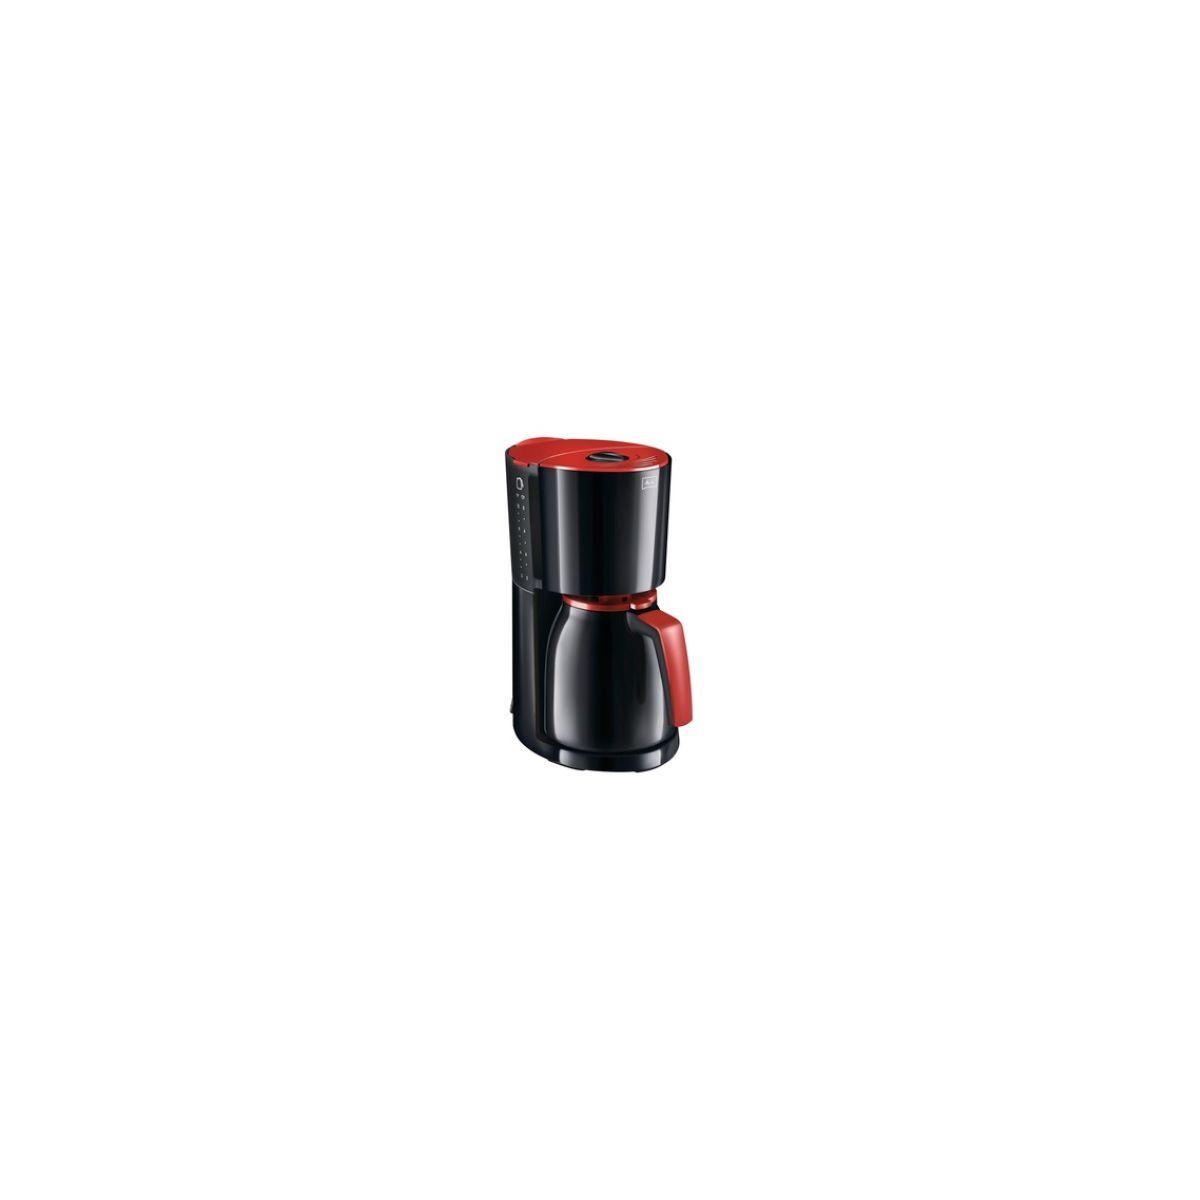 Caf-Thermos MELITTA Enjoy therm noir/rouge (photo)